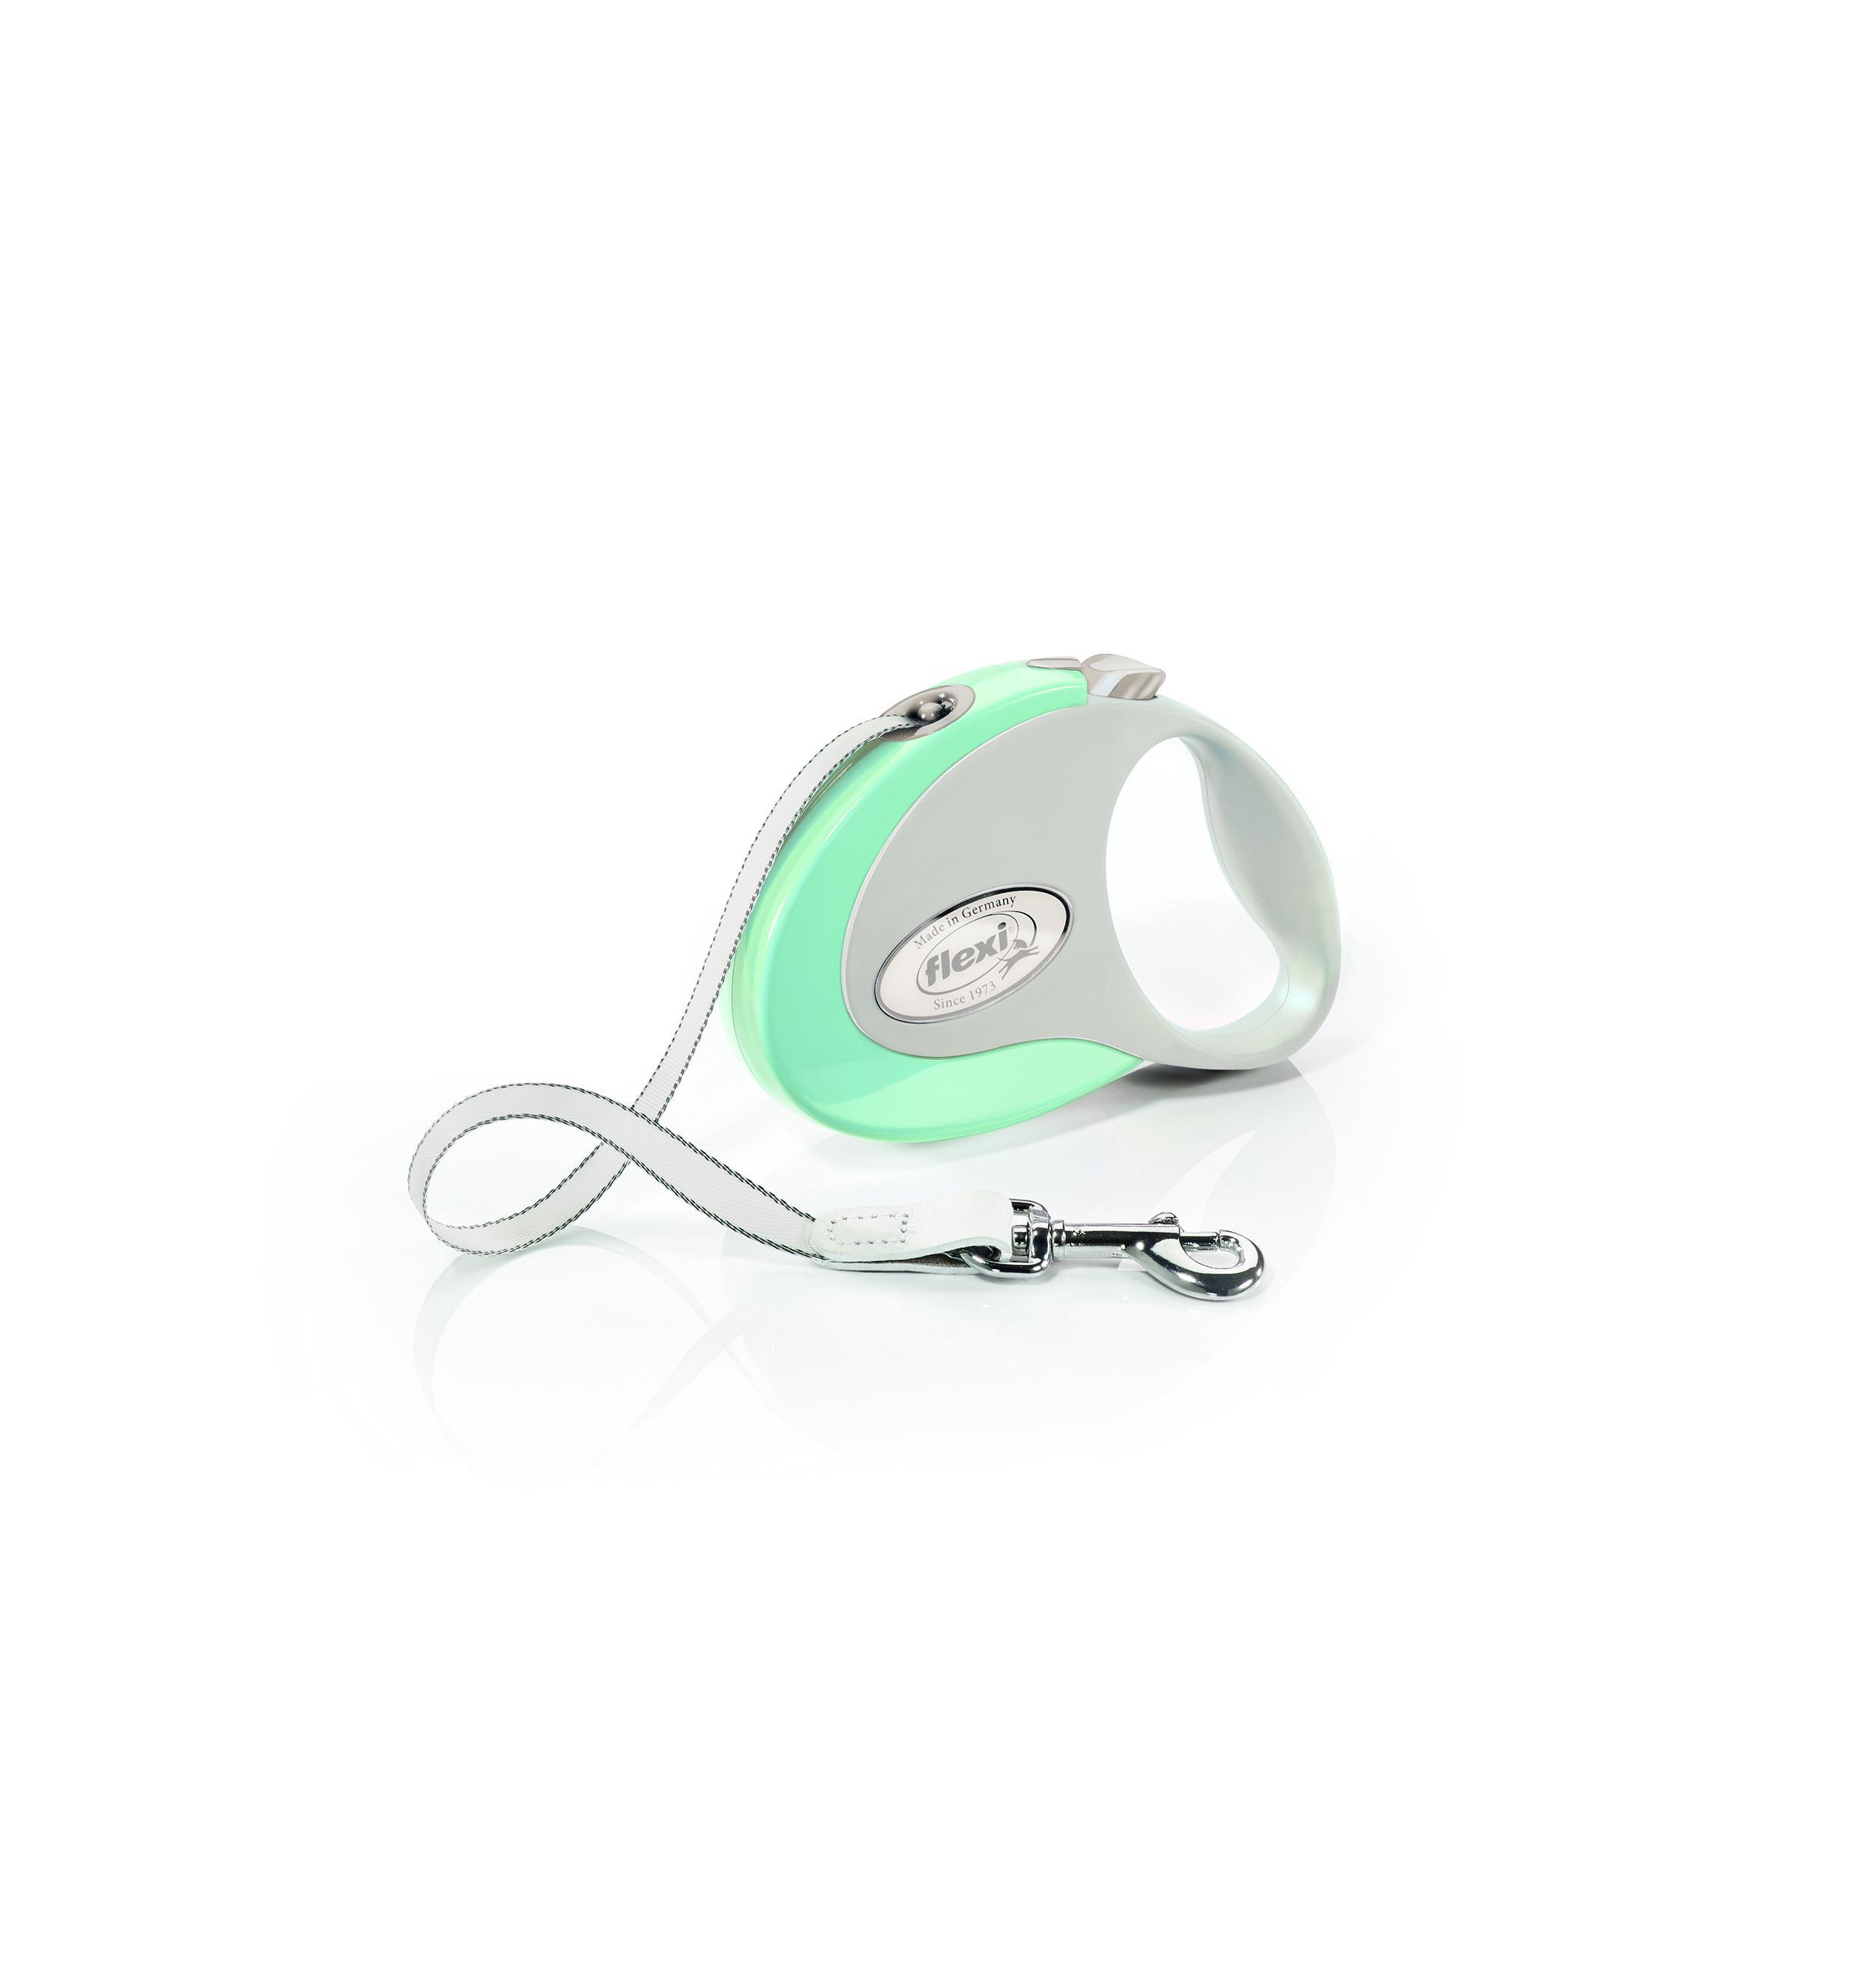 Flexi New Style Tape Dog Leash, Mint/Gray Image